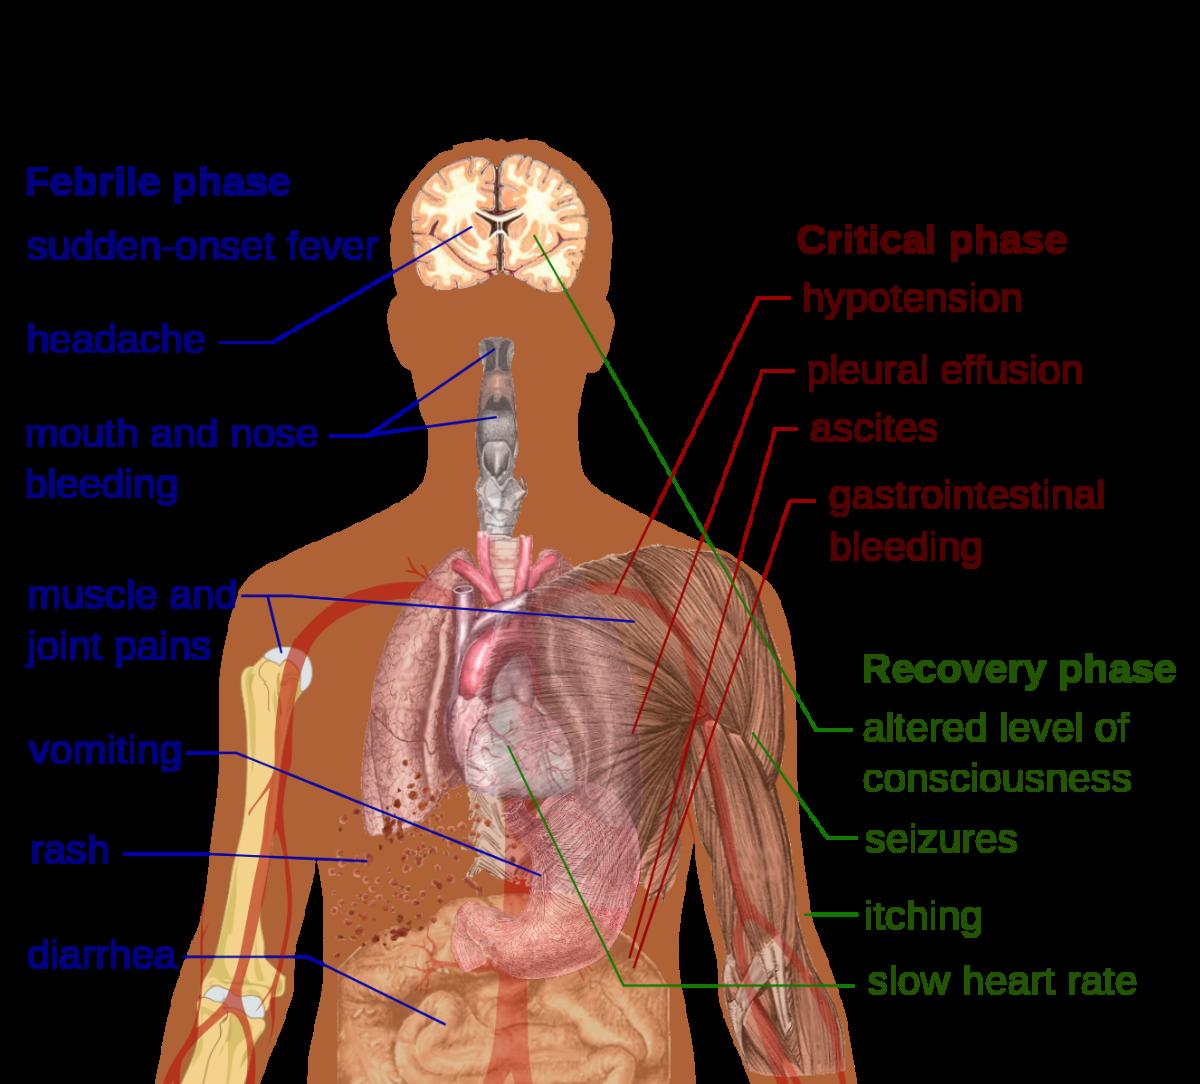 wolbachia-bacteria-may-prevent-mosquito-borne-diseases